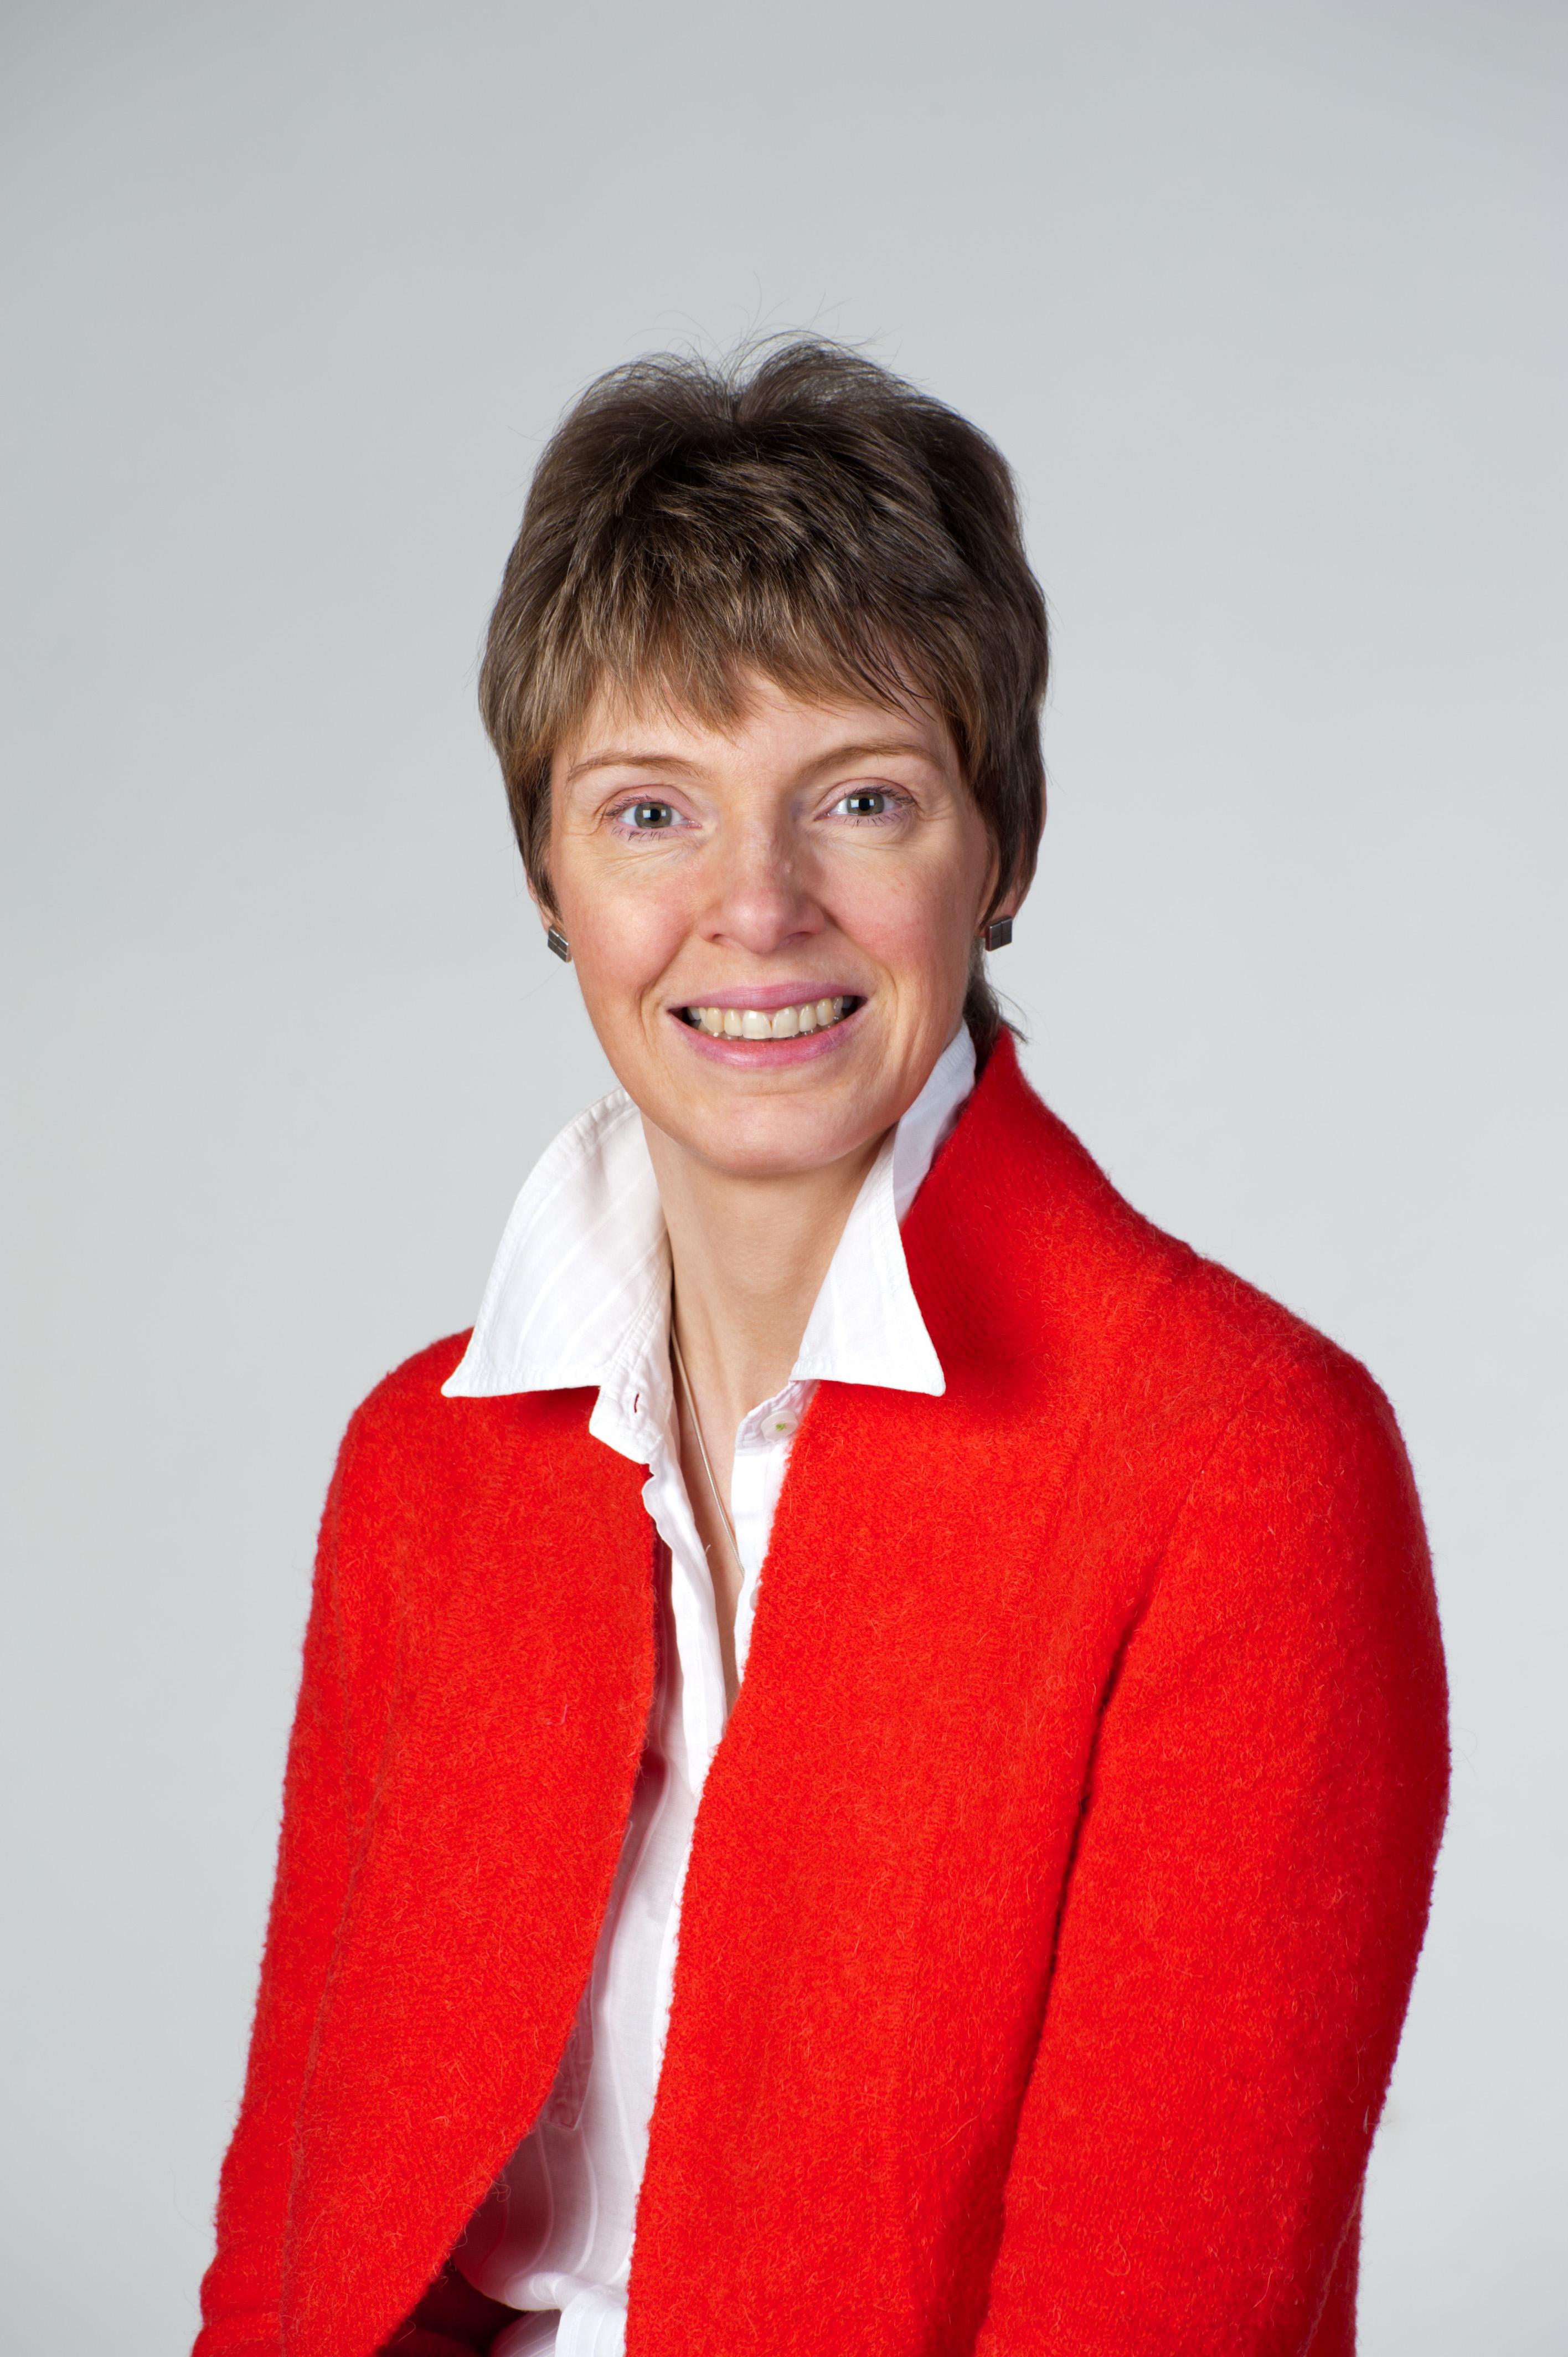 Claire Leitch